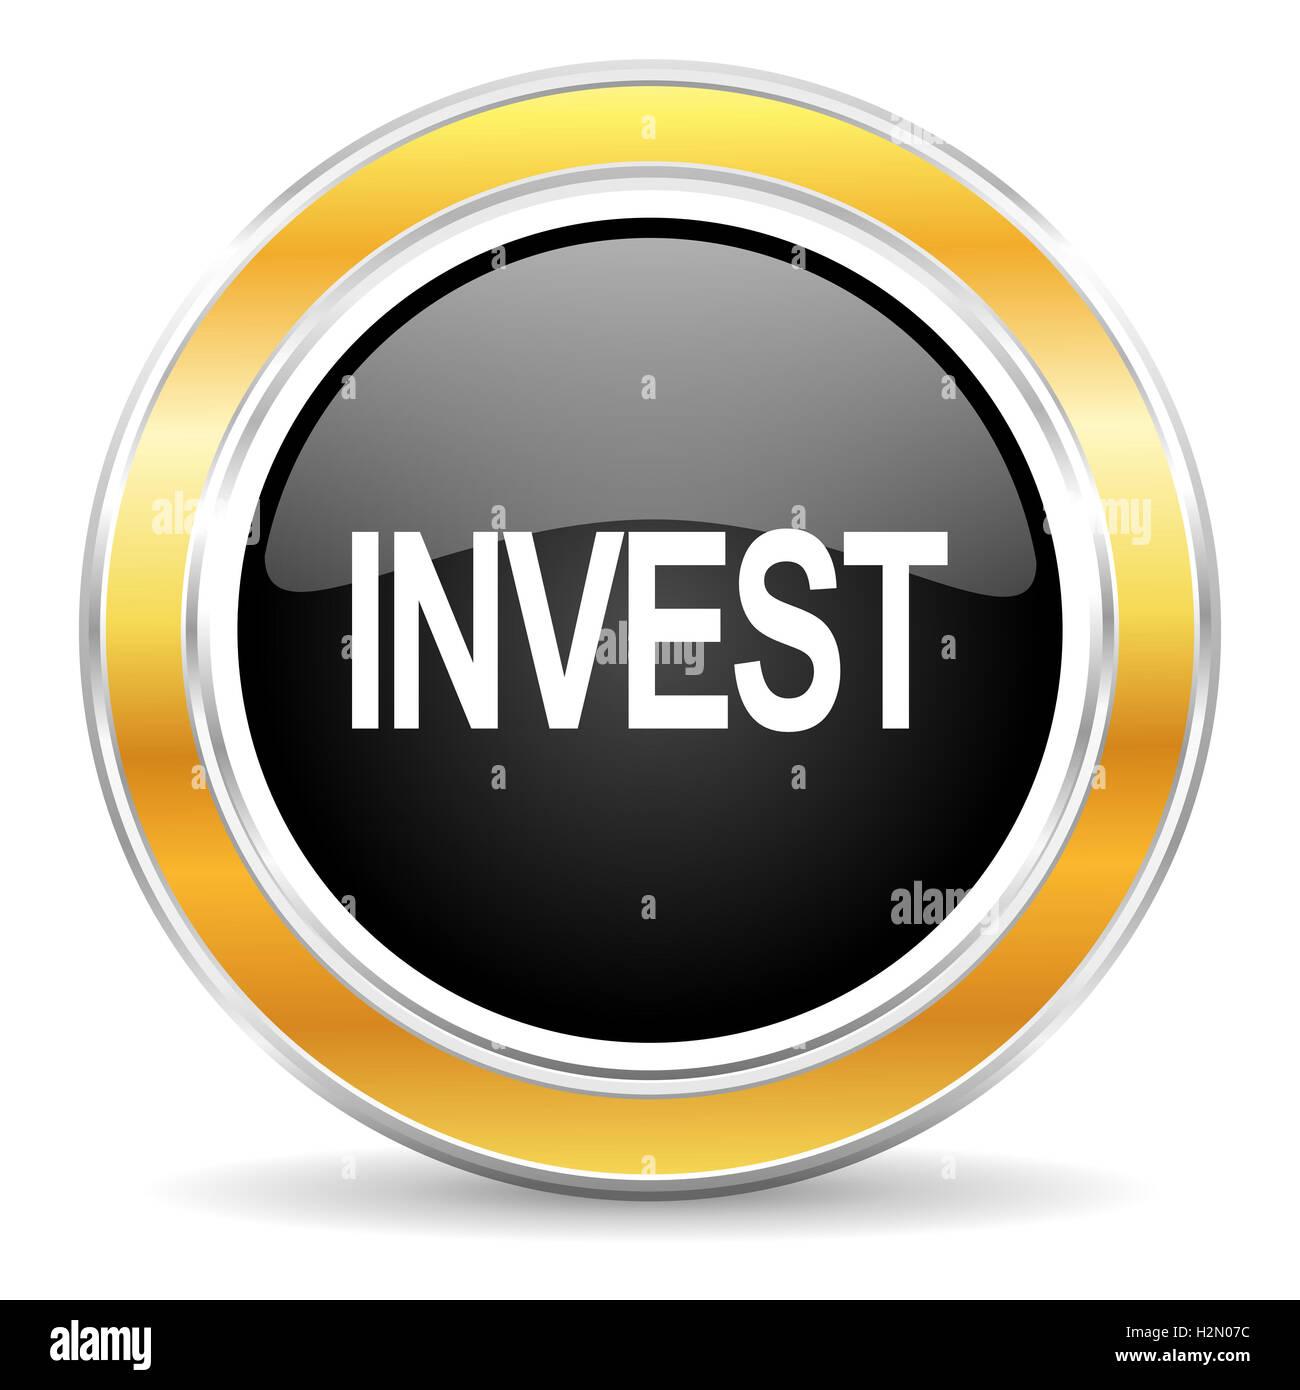 invest icon - Stock Image